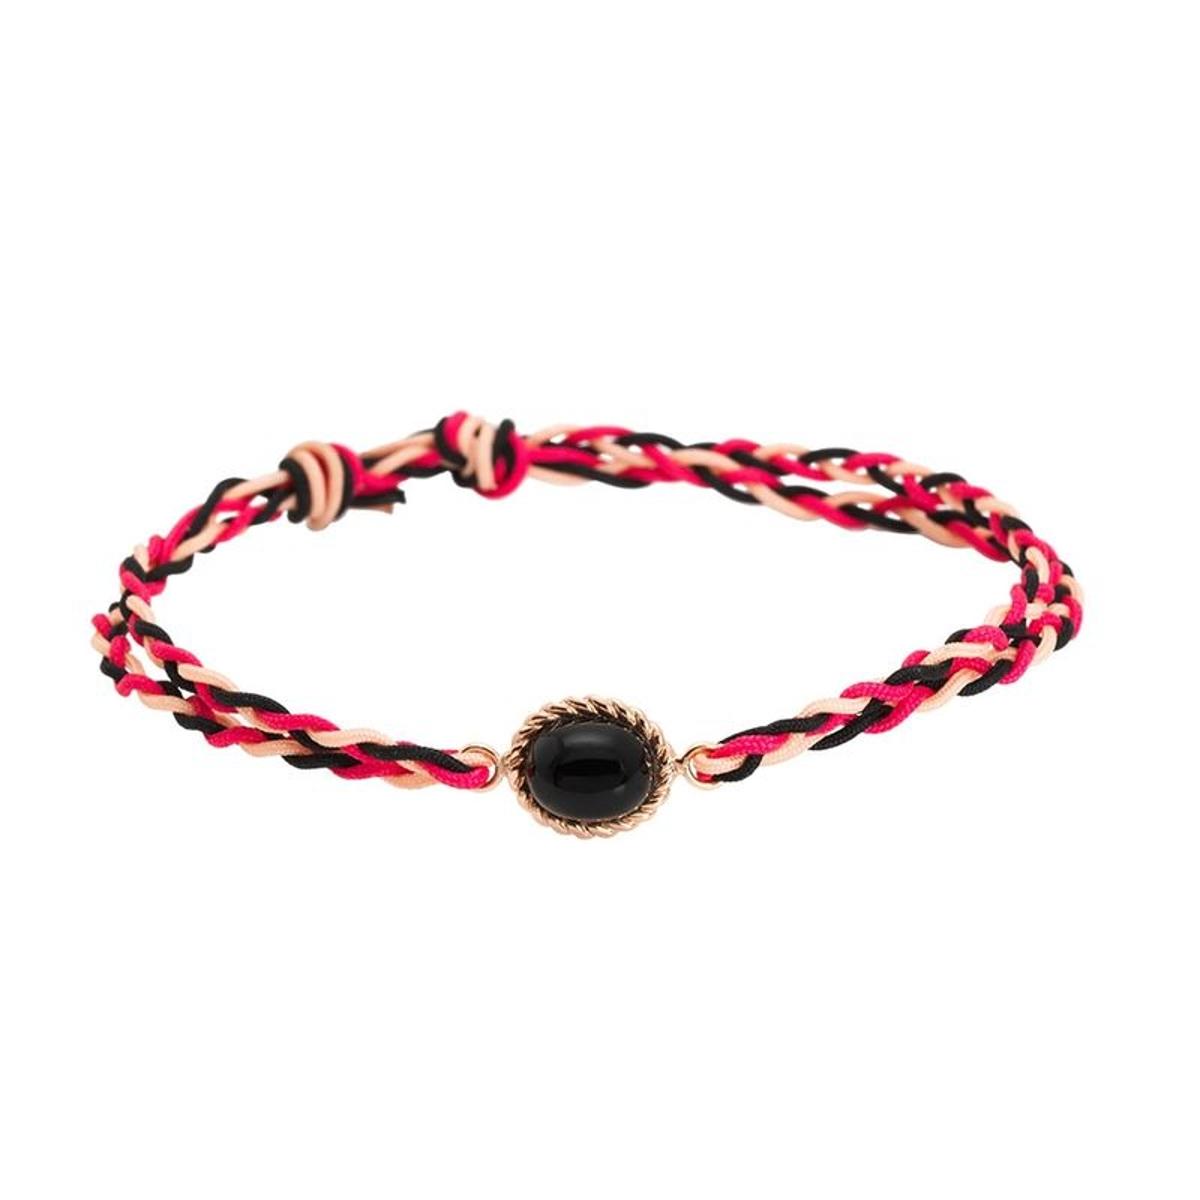 Bracelet Cordon Berlingot Mini Or Rose Onyx